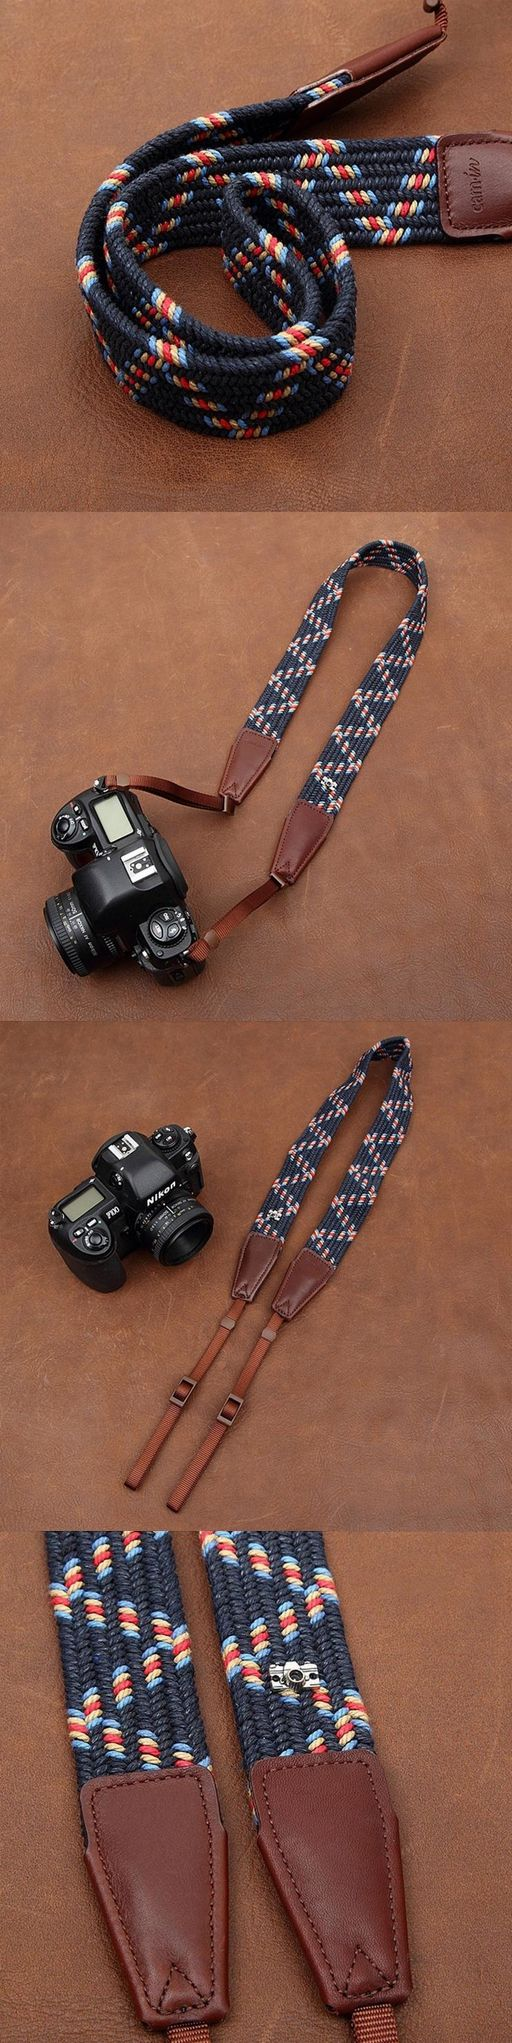 Weaving Style DSLR Deep Blue Sony Nikon Canon Handmade Leather Camera Strap 8792 by i-cam